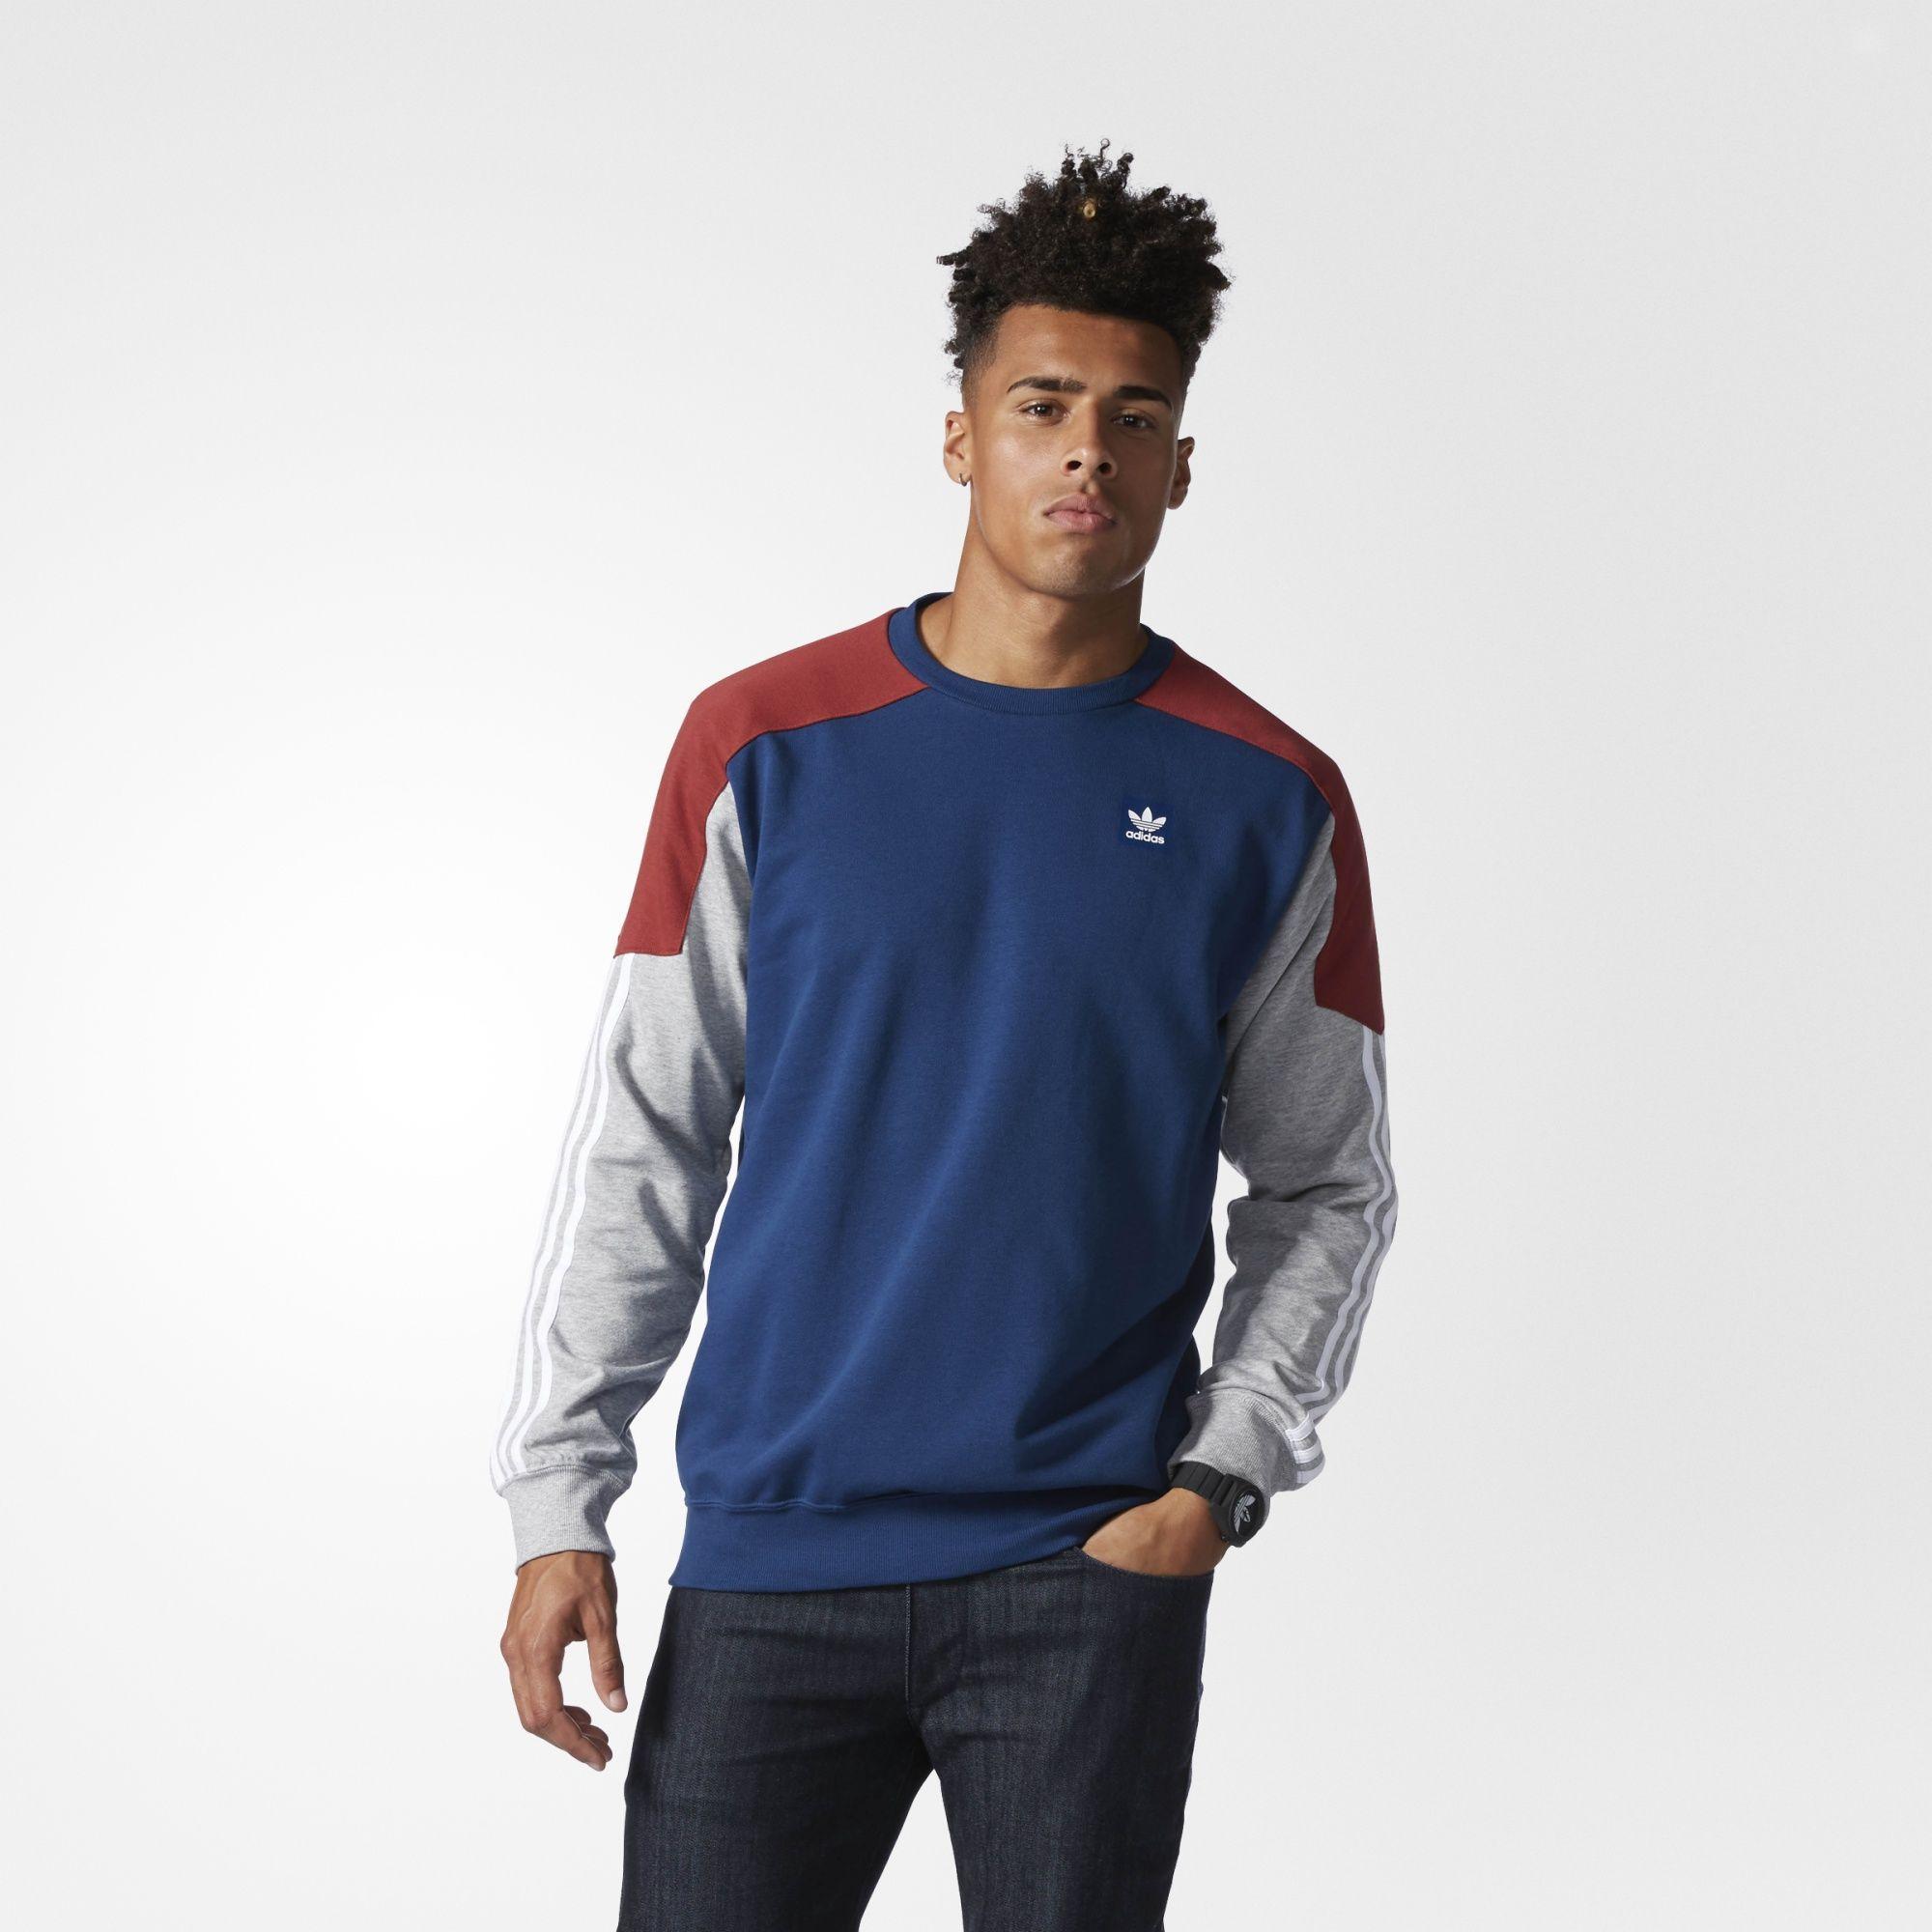 Nautical Climalite SportswearMens Nautical Adidas Climalite SweatshirtWearables Climalite SweatshirtWearables SportswearMens Adidas gbfyY76